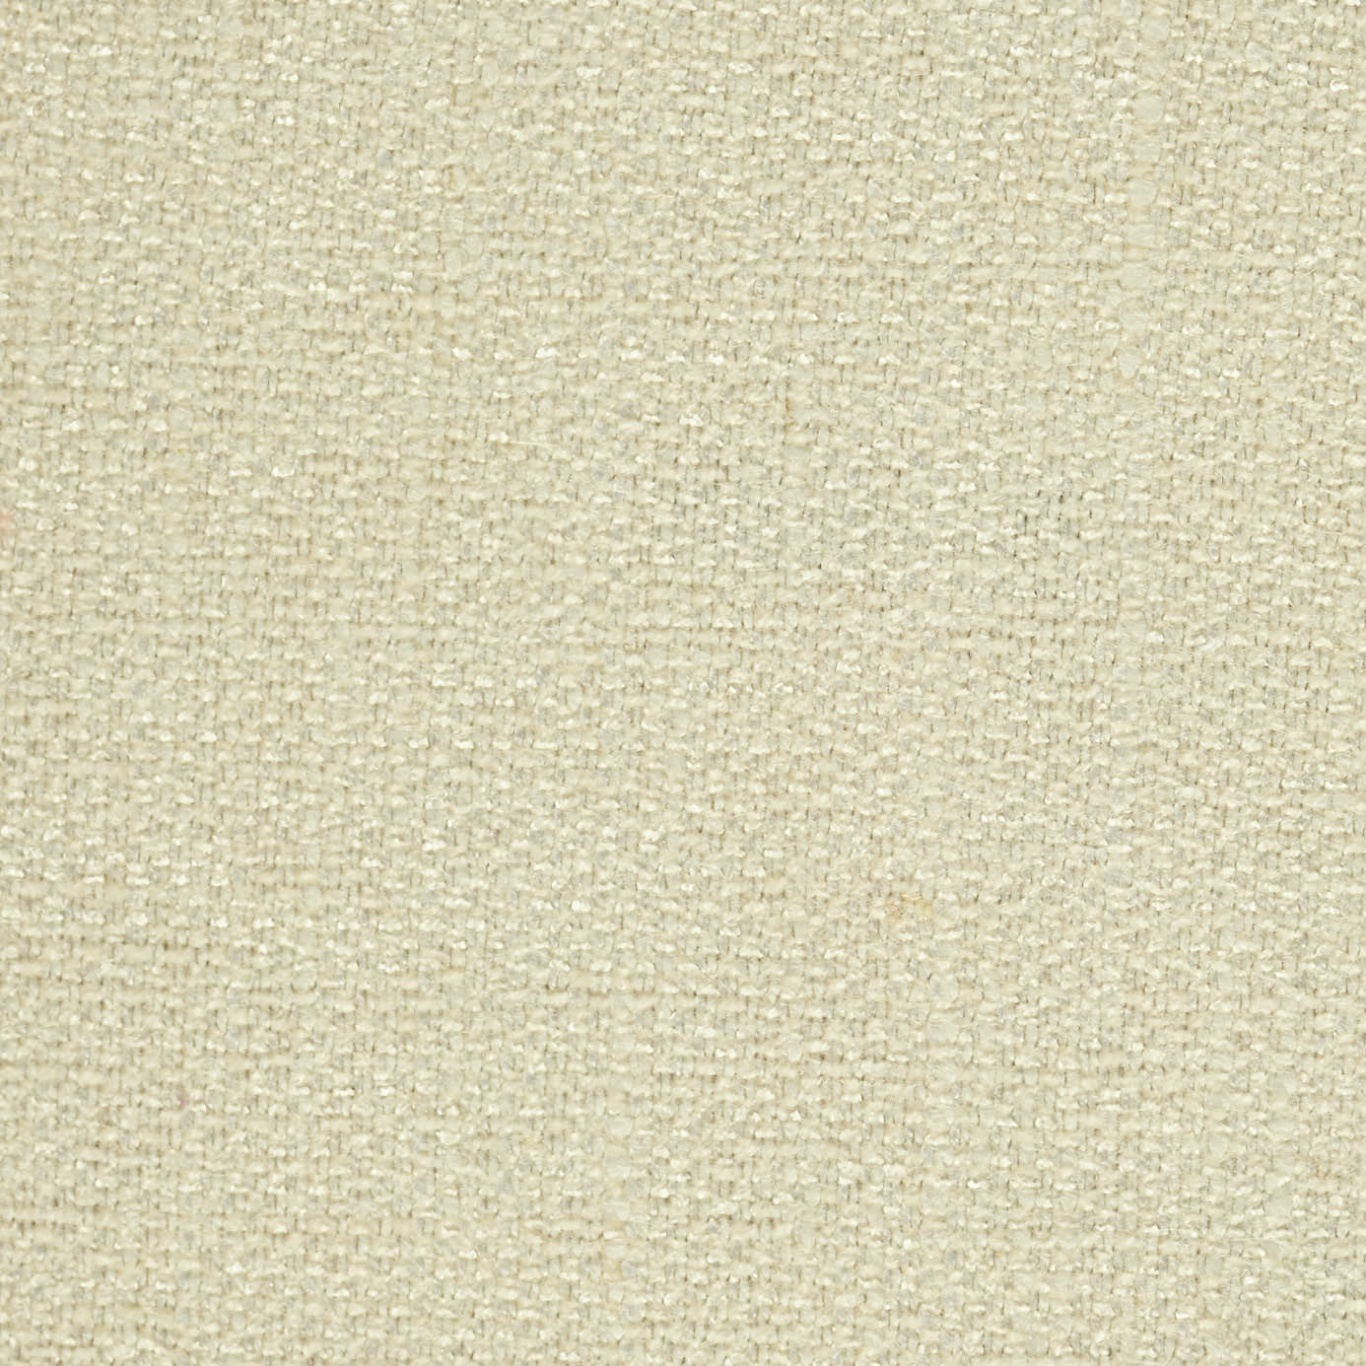 Image of Harlequin Molecule Eggshell Fabric 440310